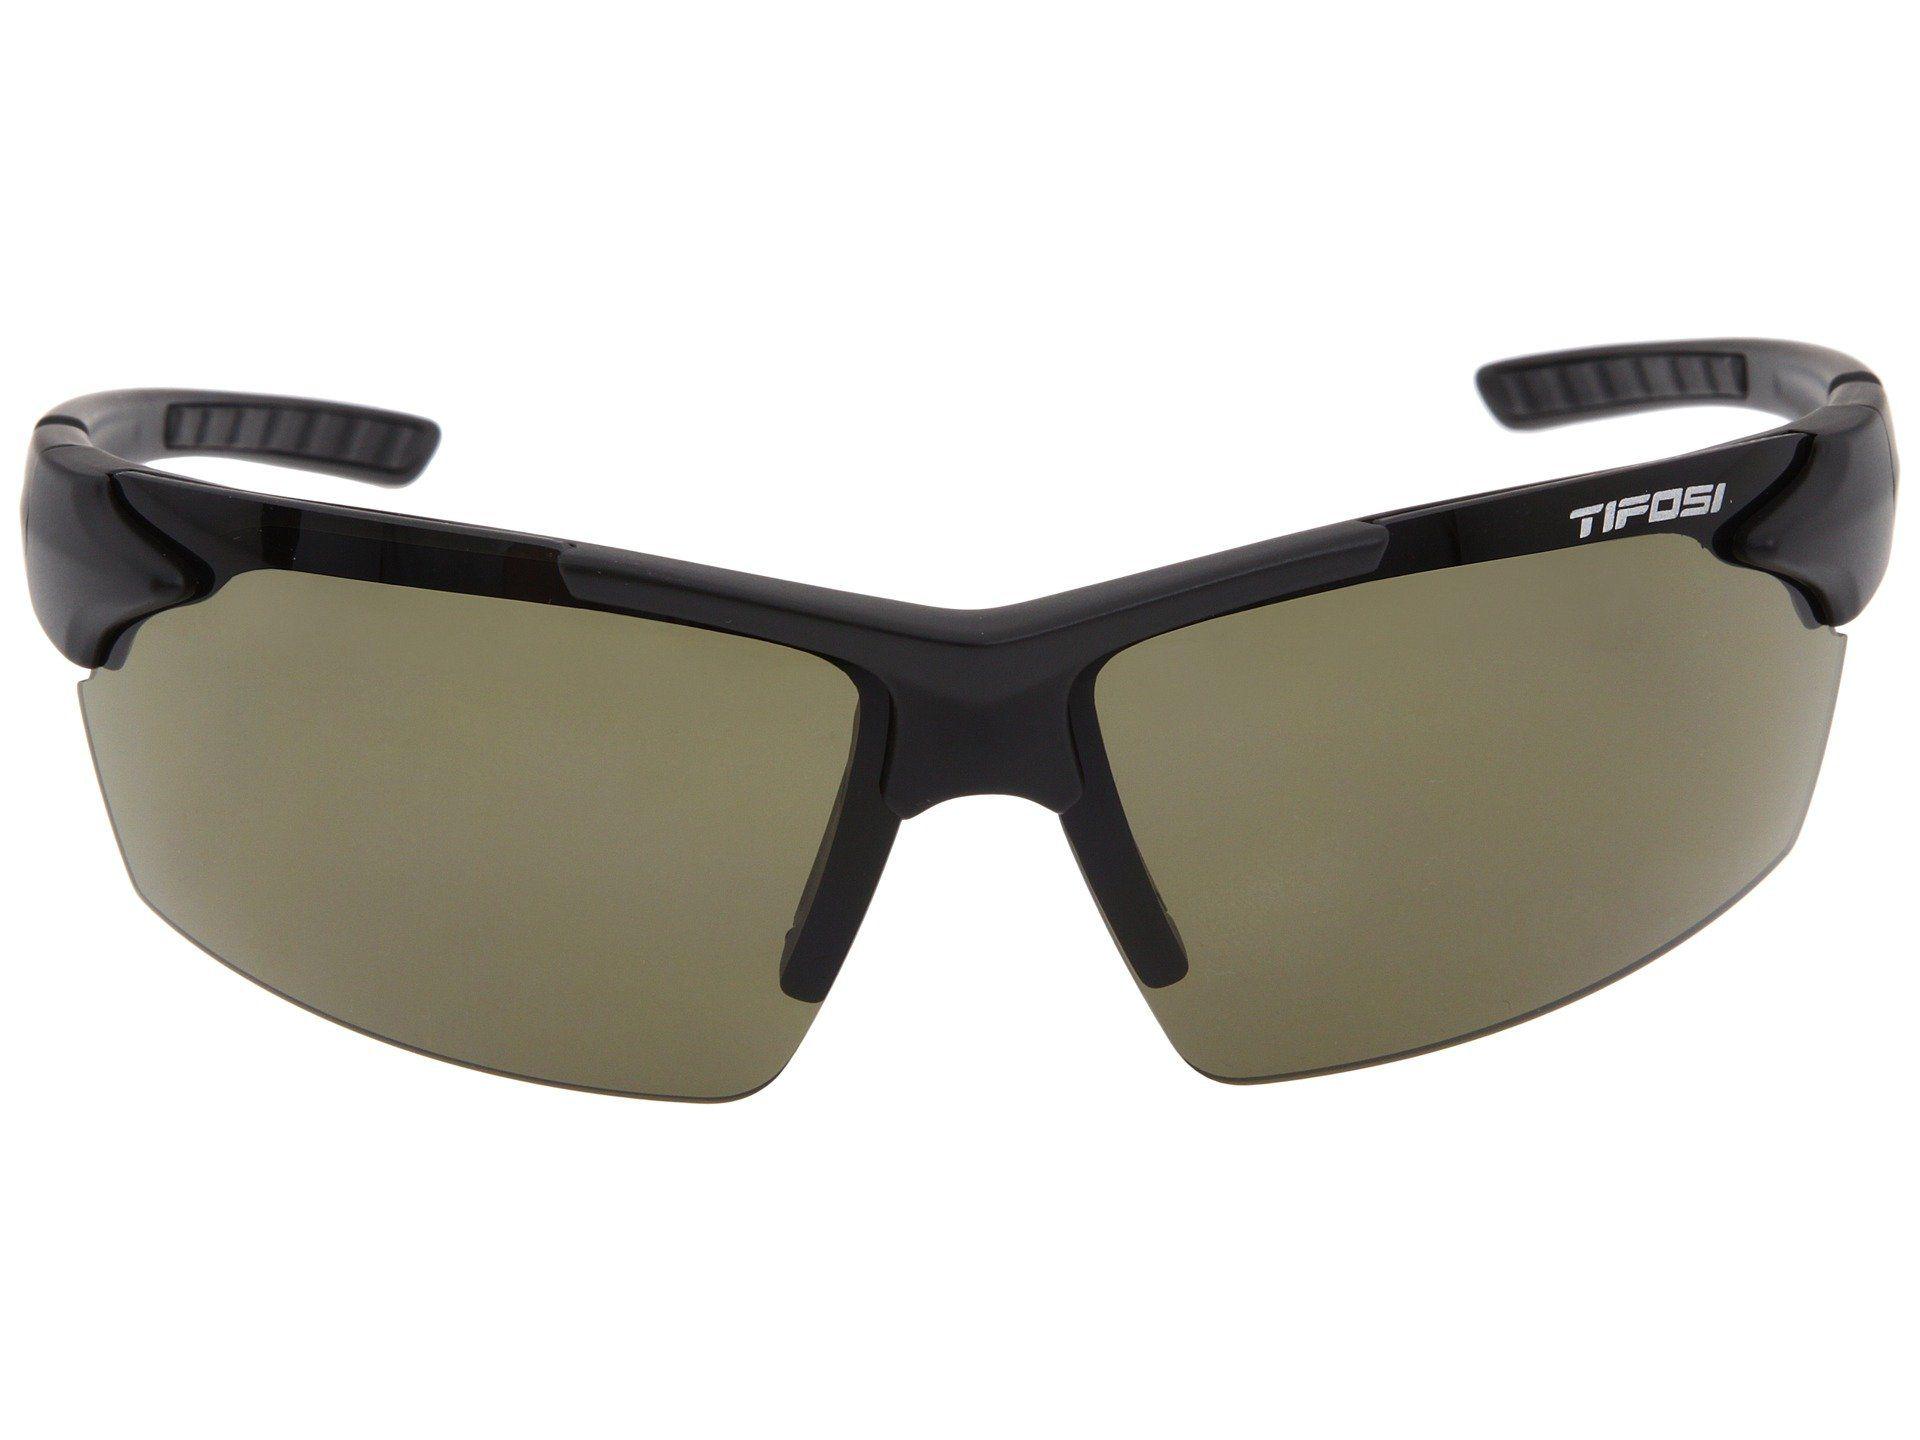 cfb61da813 Best for Women  Tifosi Optics Jet Sunglasses